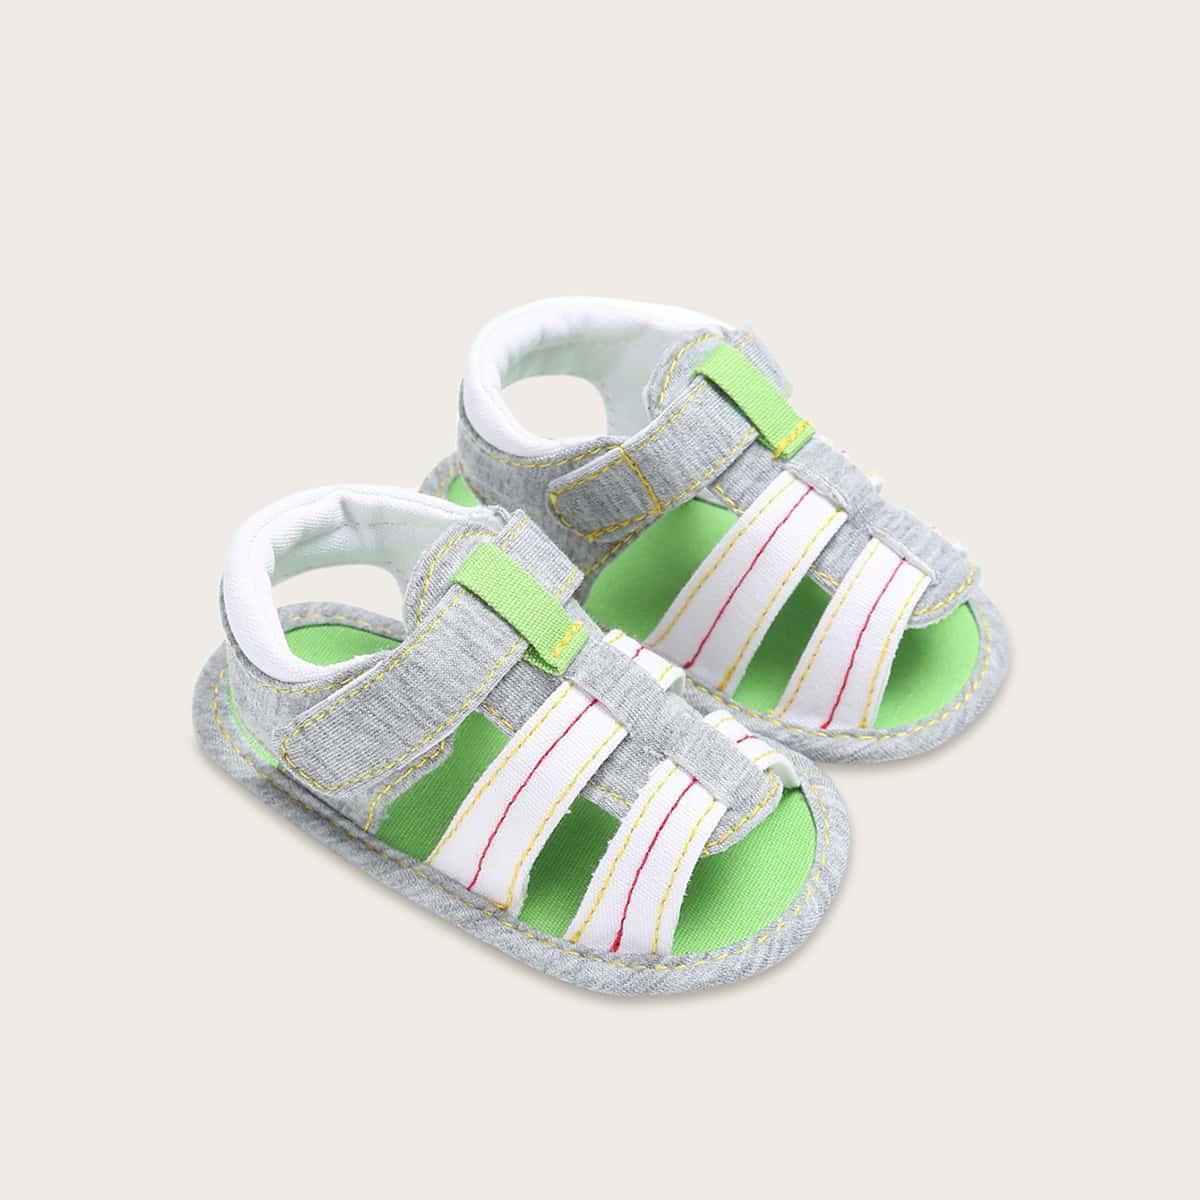 Детские гладиаторские сандалии с ремешком на липучке от SHEIN